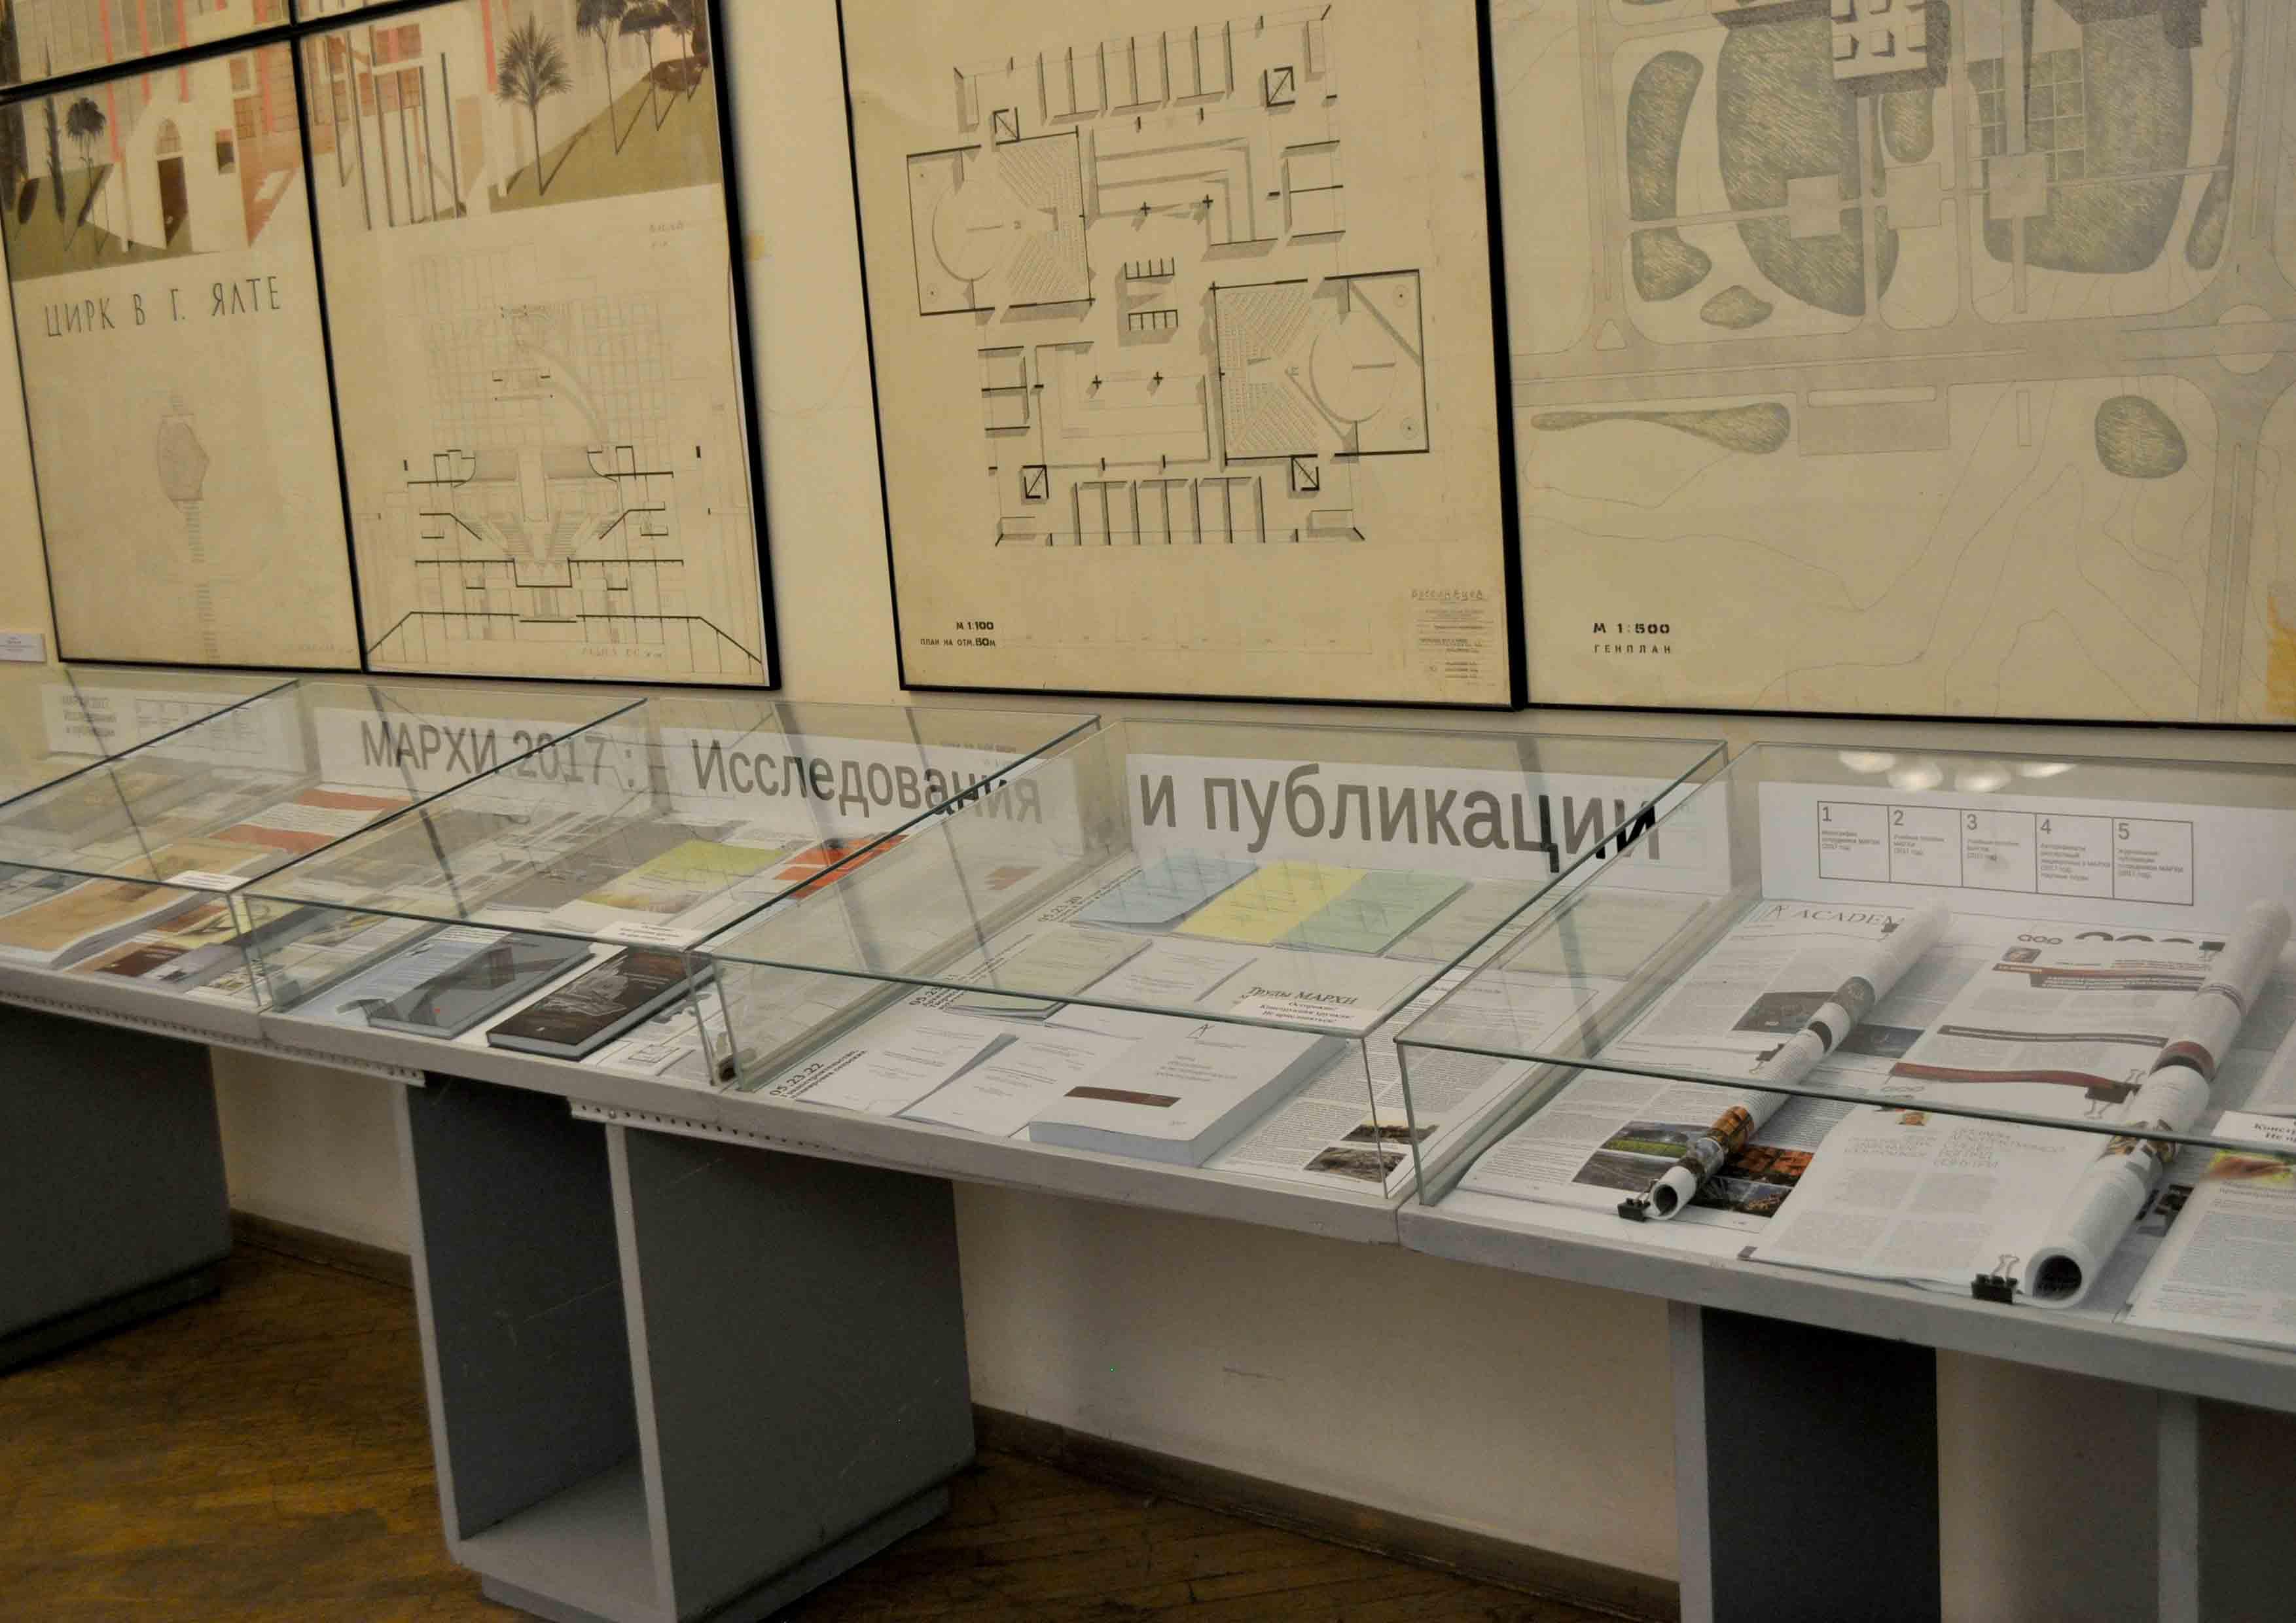 Дни науки – 2018: выставка «МАРХИ-2017: исследования и публикации»